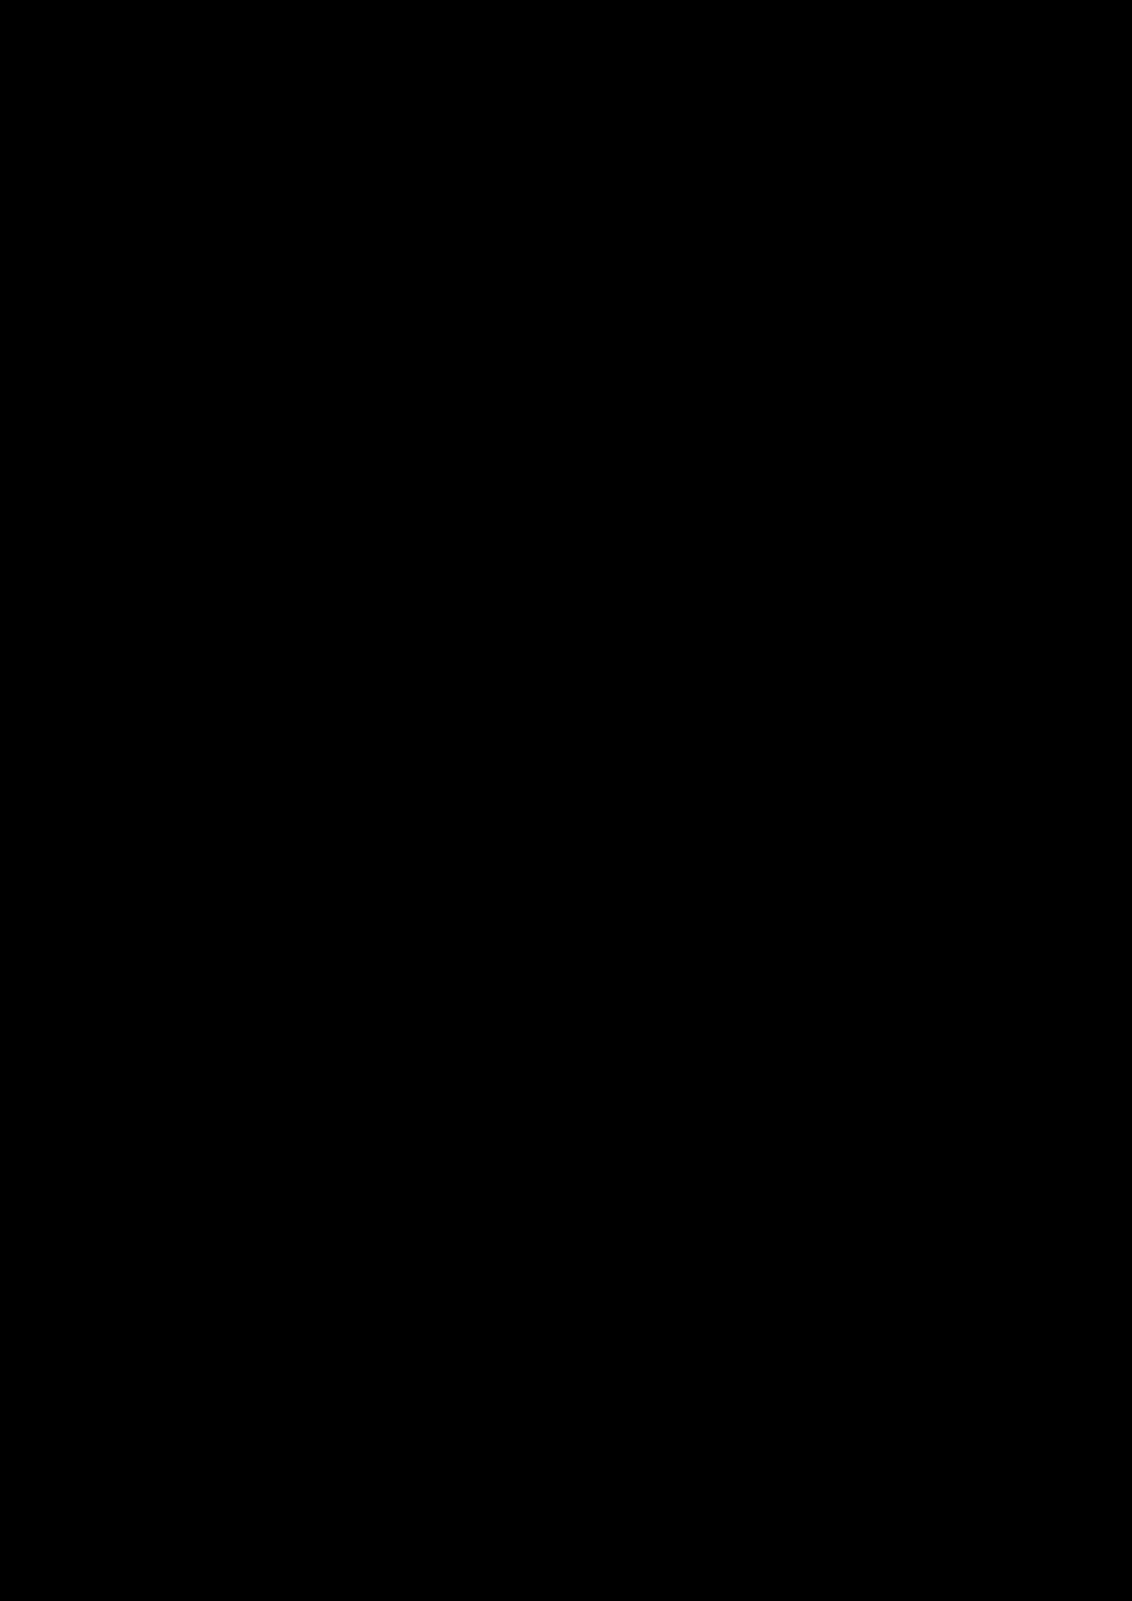 Belyiy sokol slide, Image 54